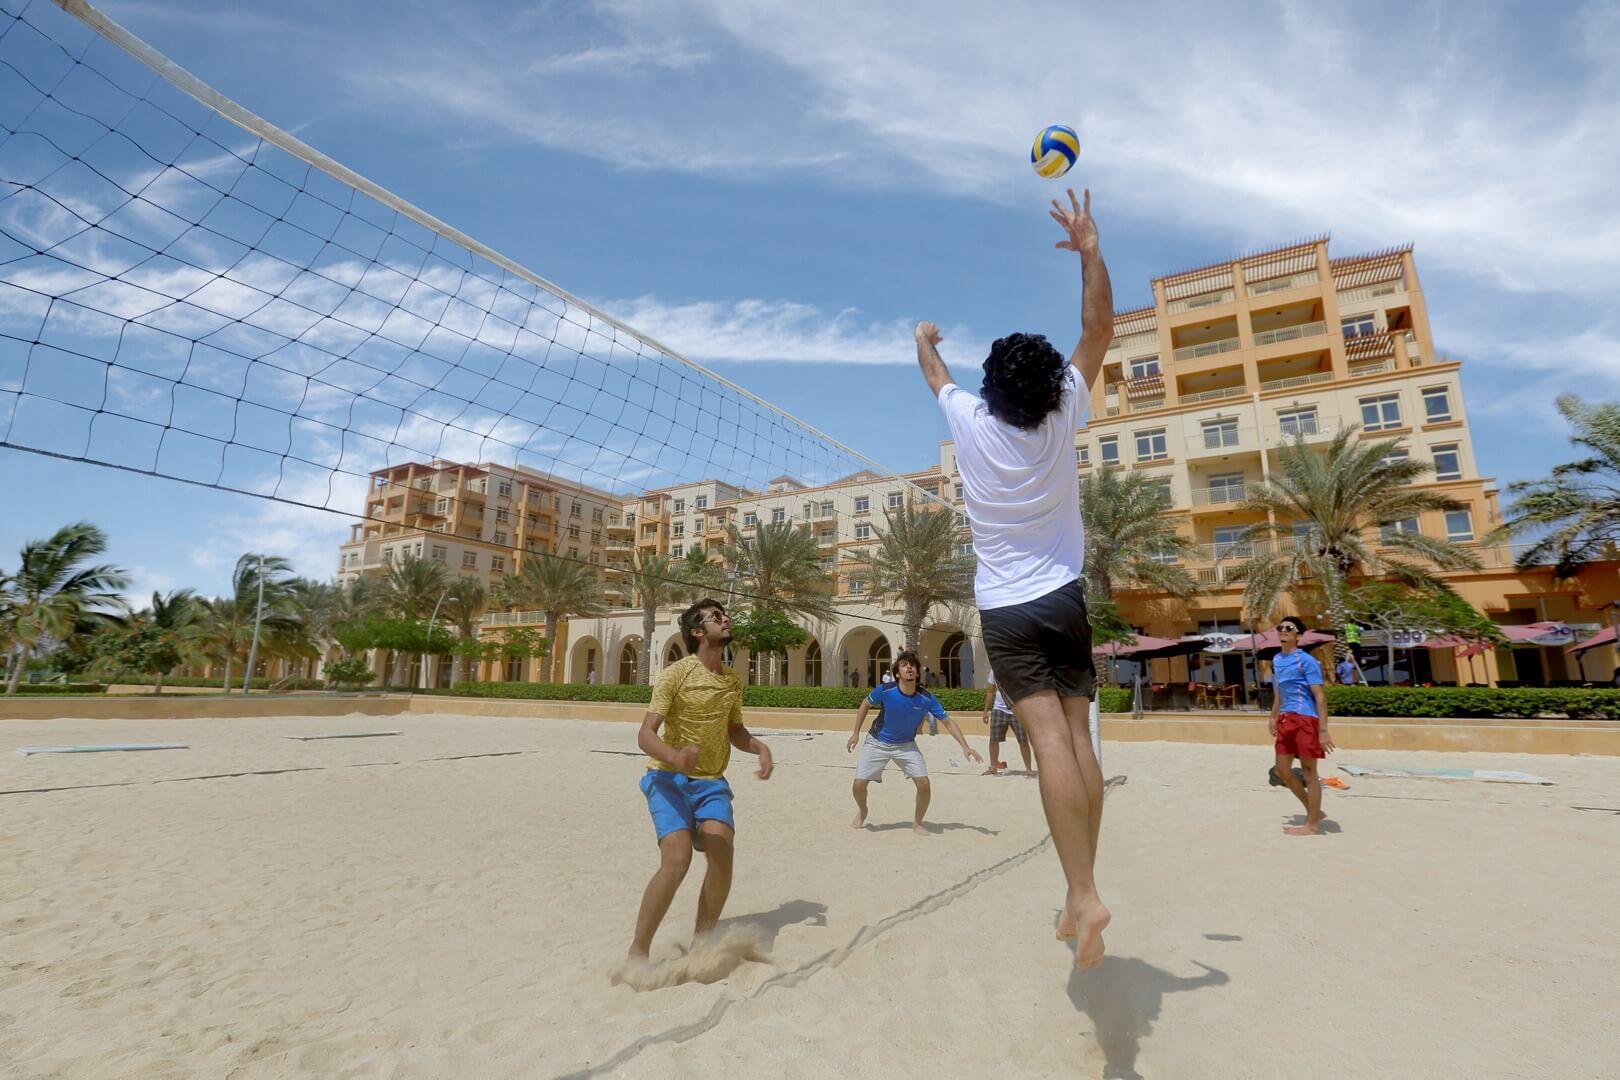 Bay La Sun beach - KAEC